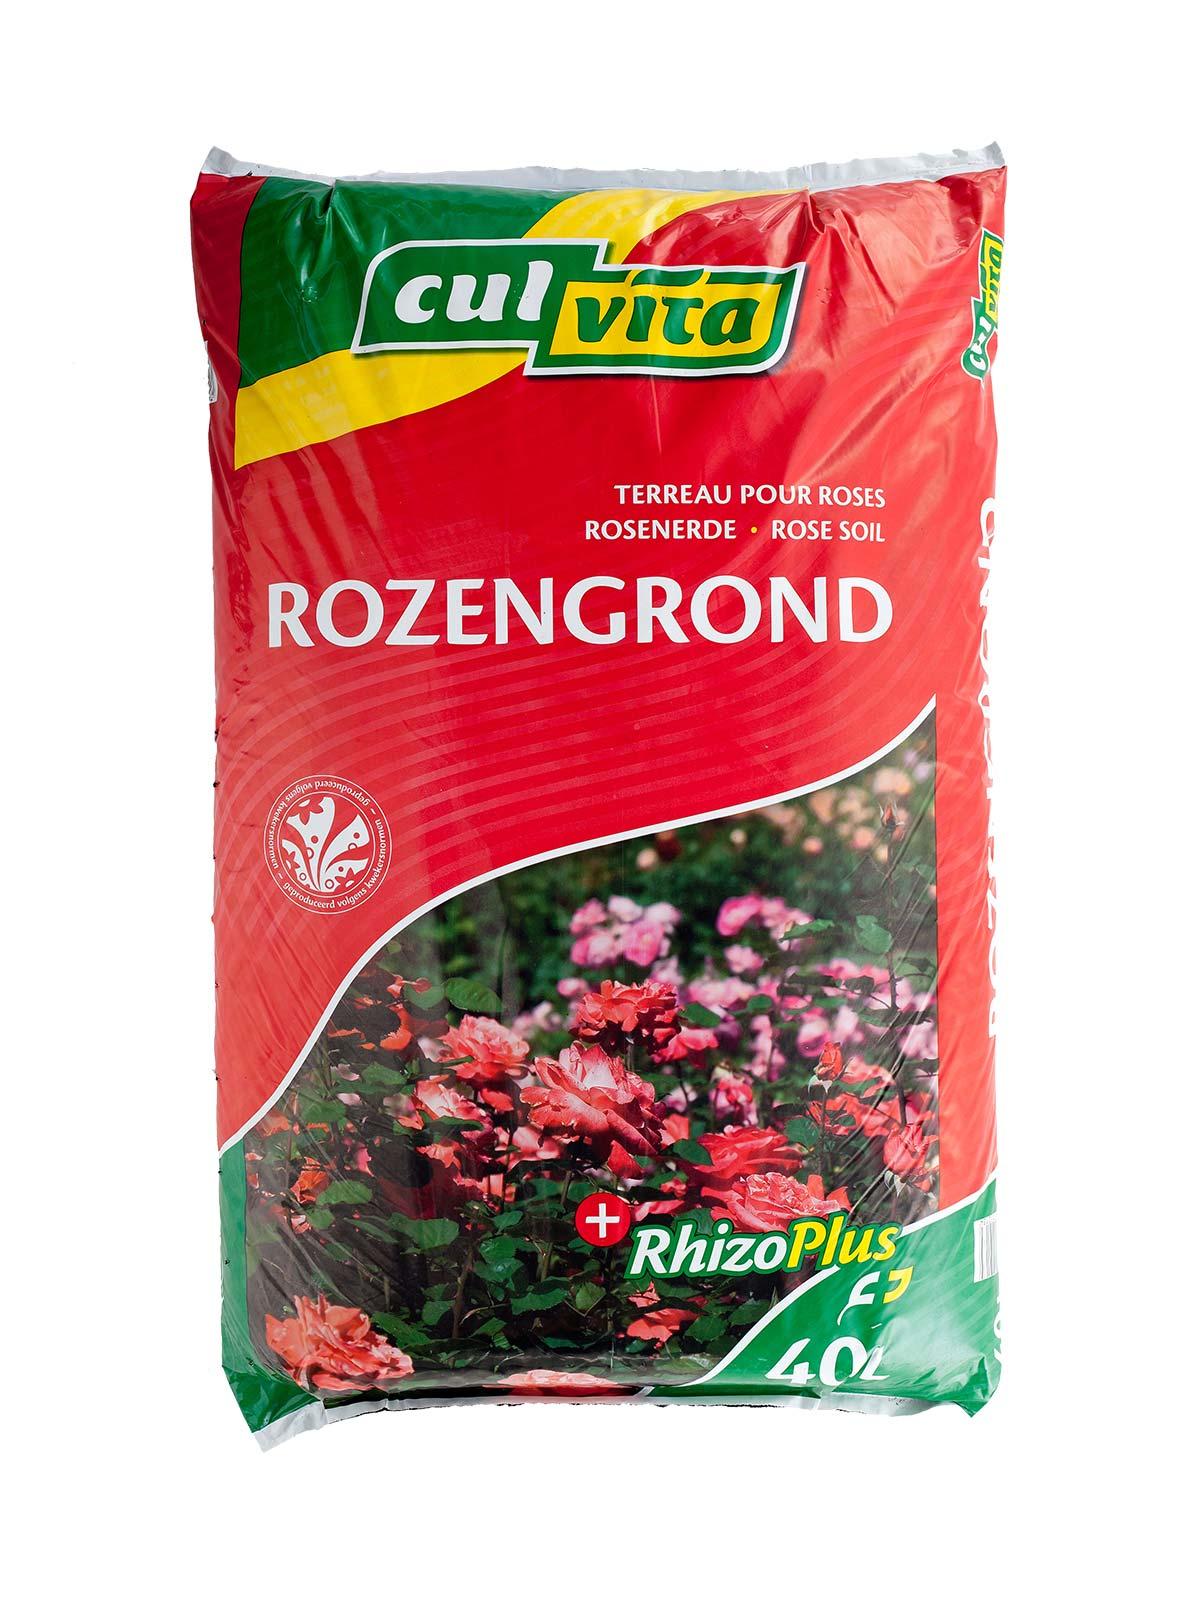 Culvita Rozengrond | Culvita.nl